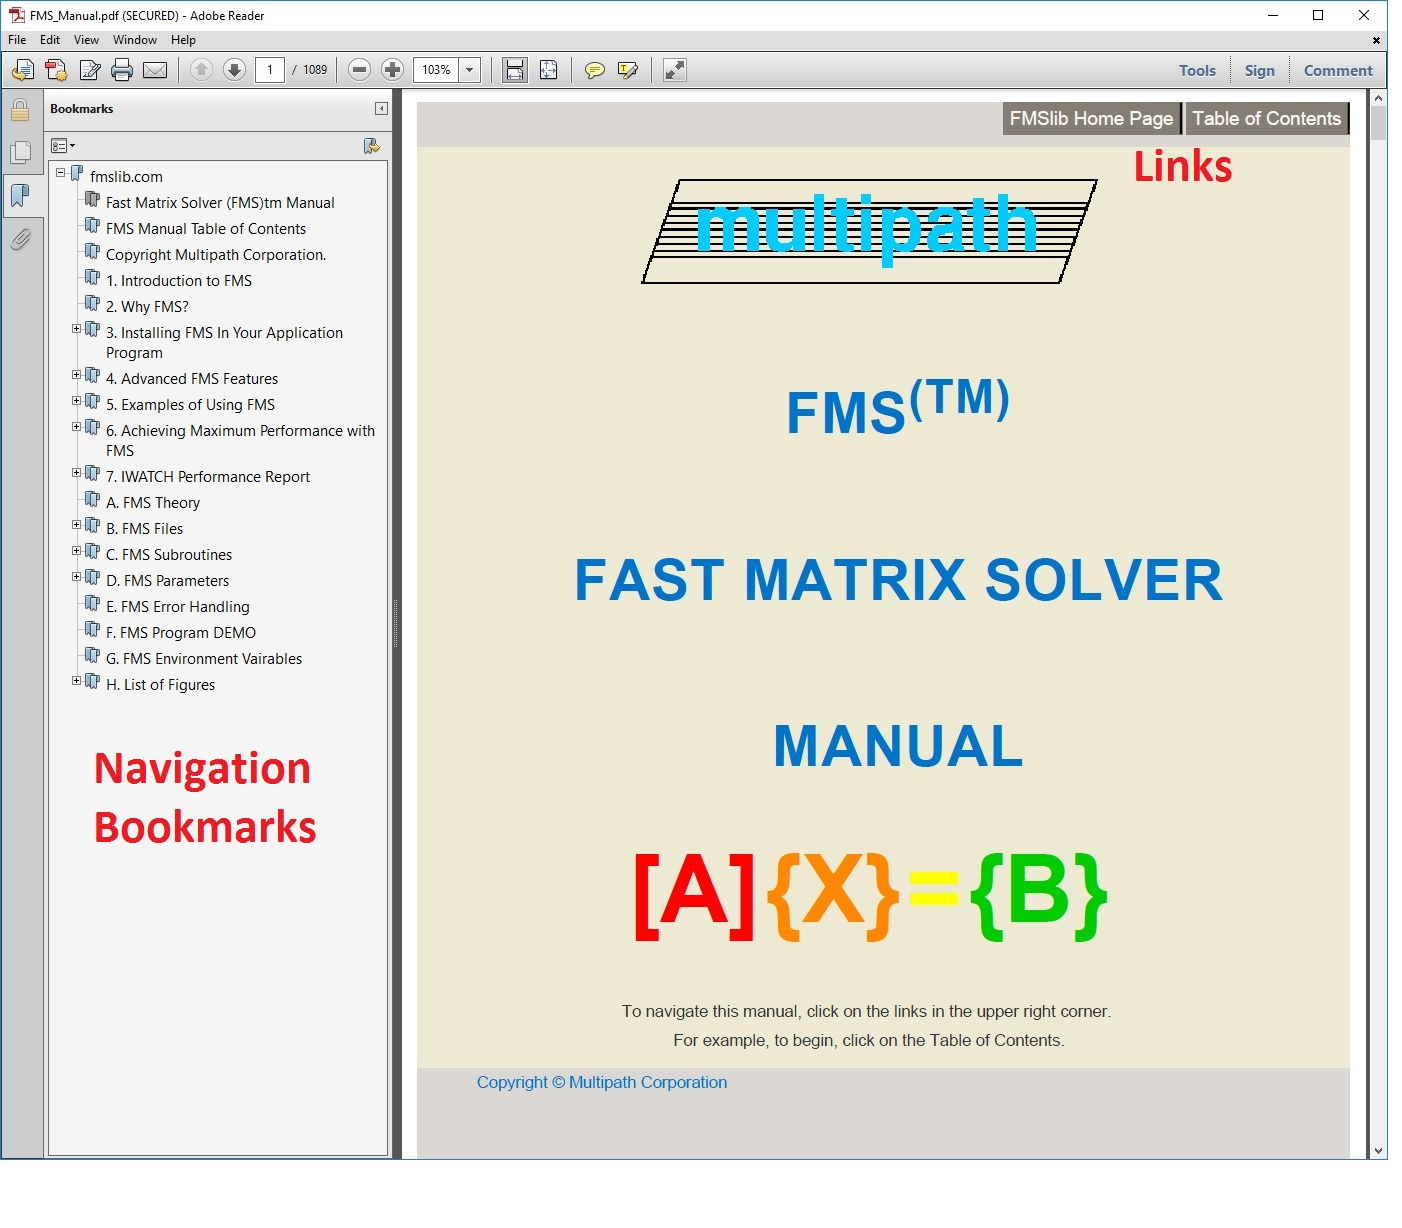 viewing the fms manual rh fmslib com